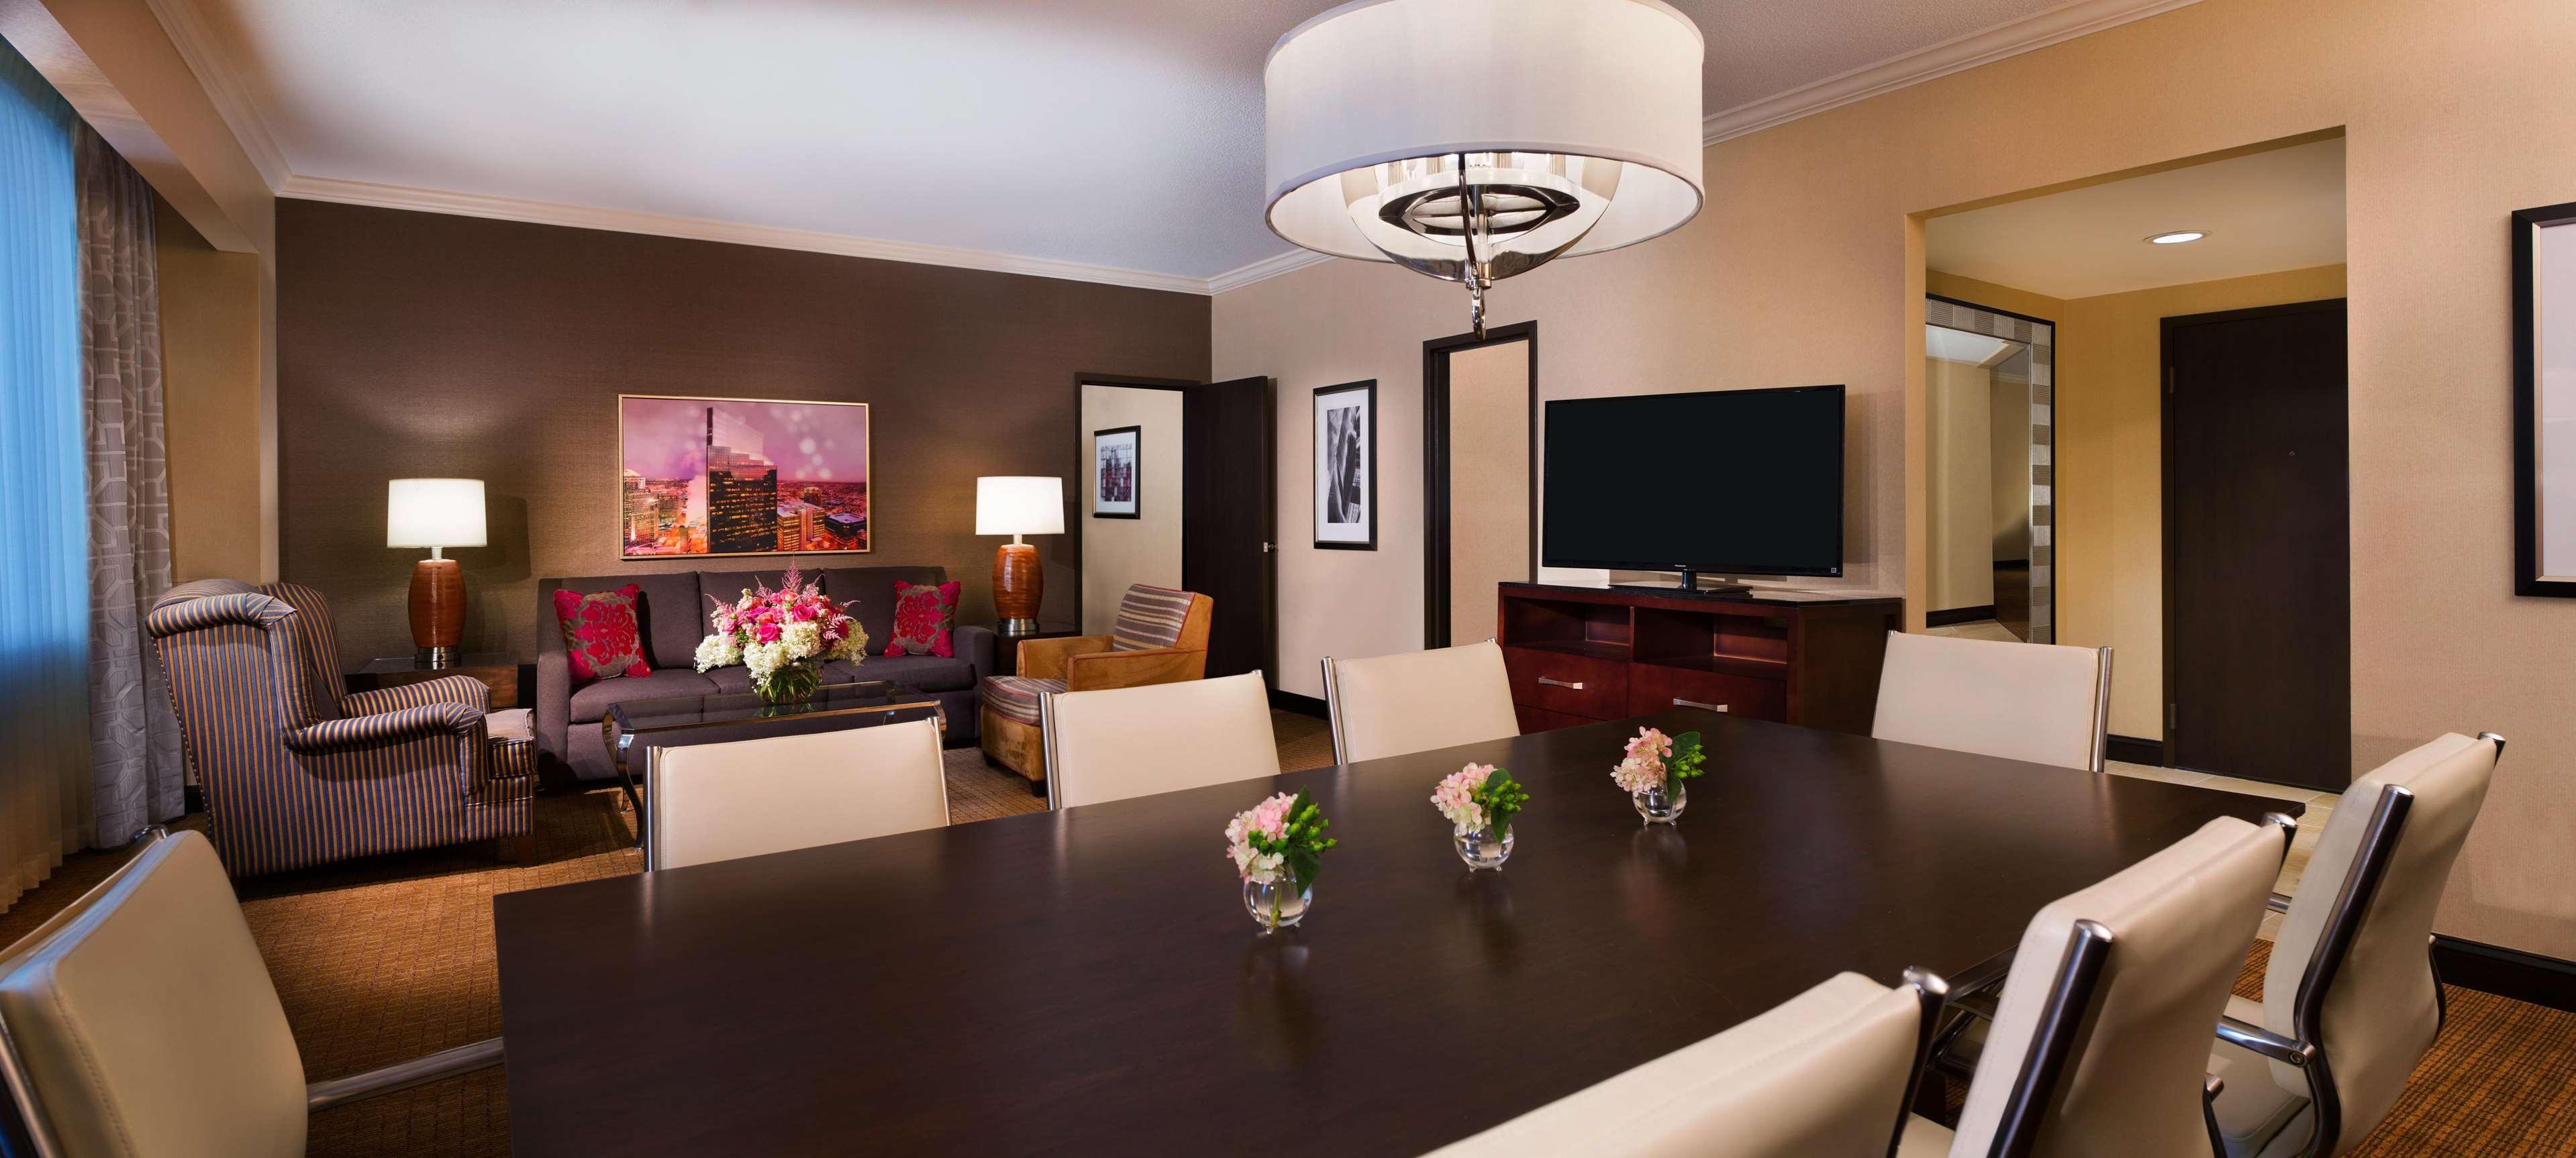 Caribou Coffee Minneapolis Meeting Rooms